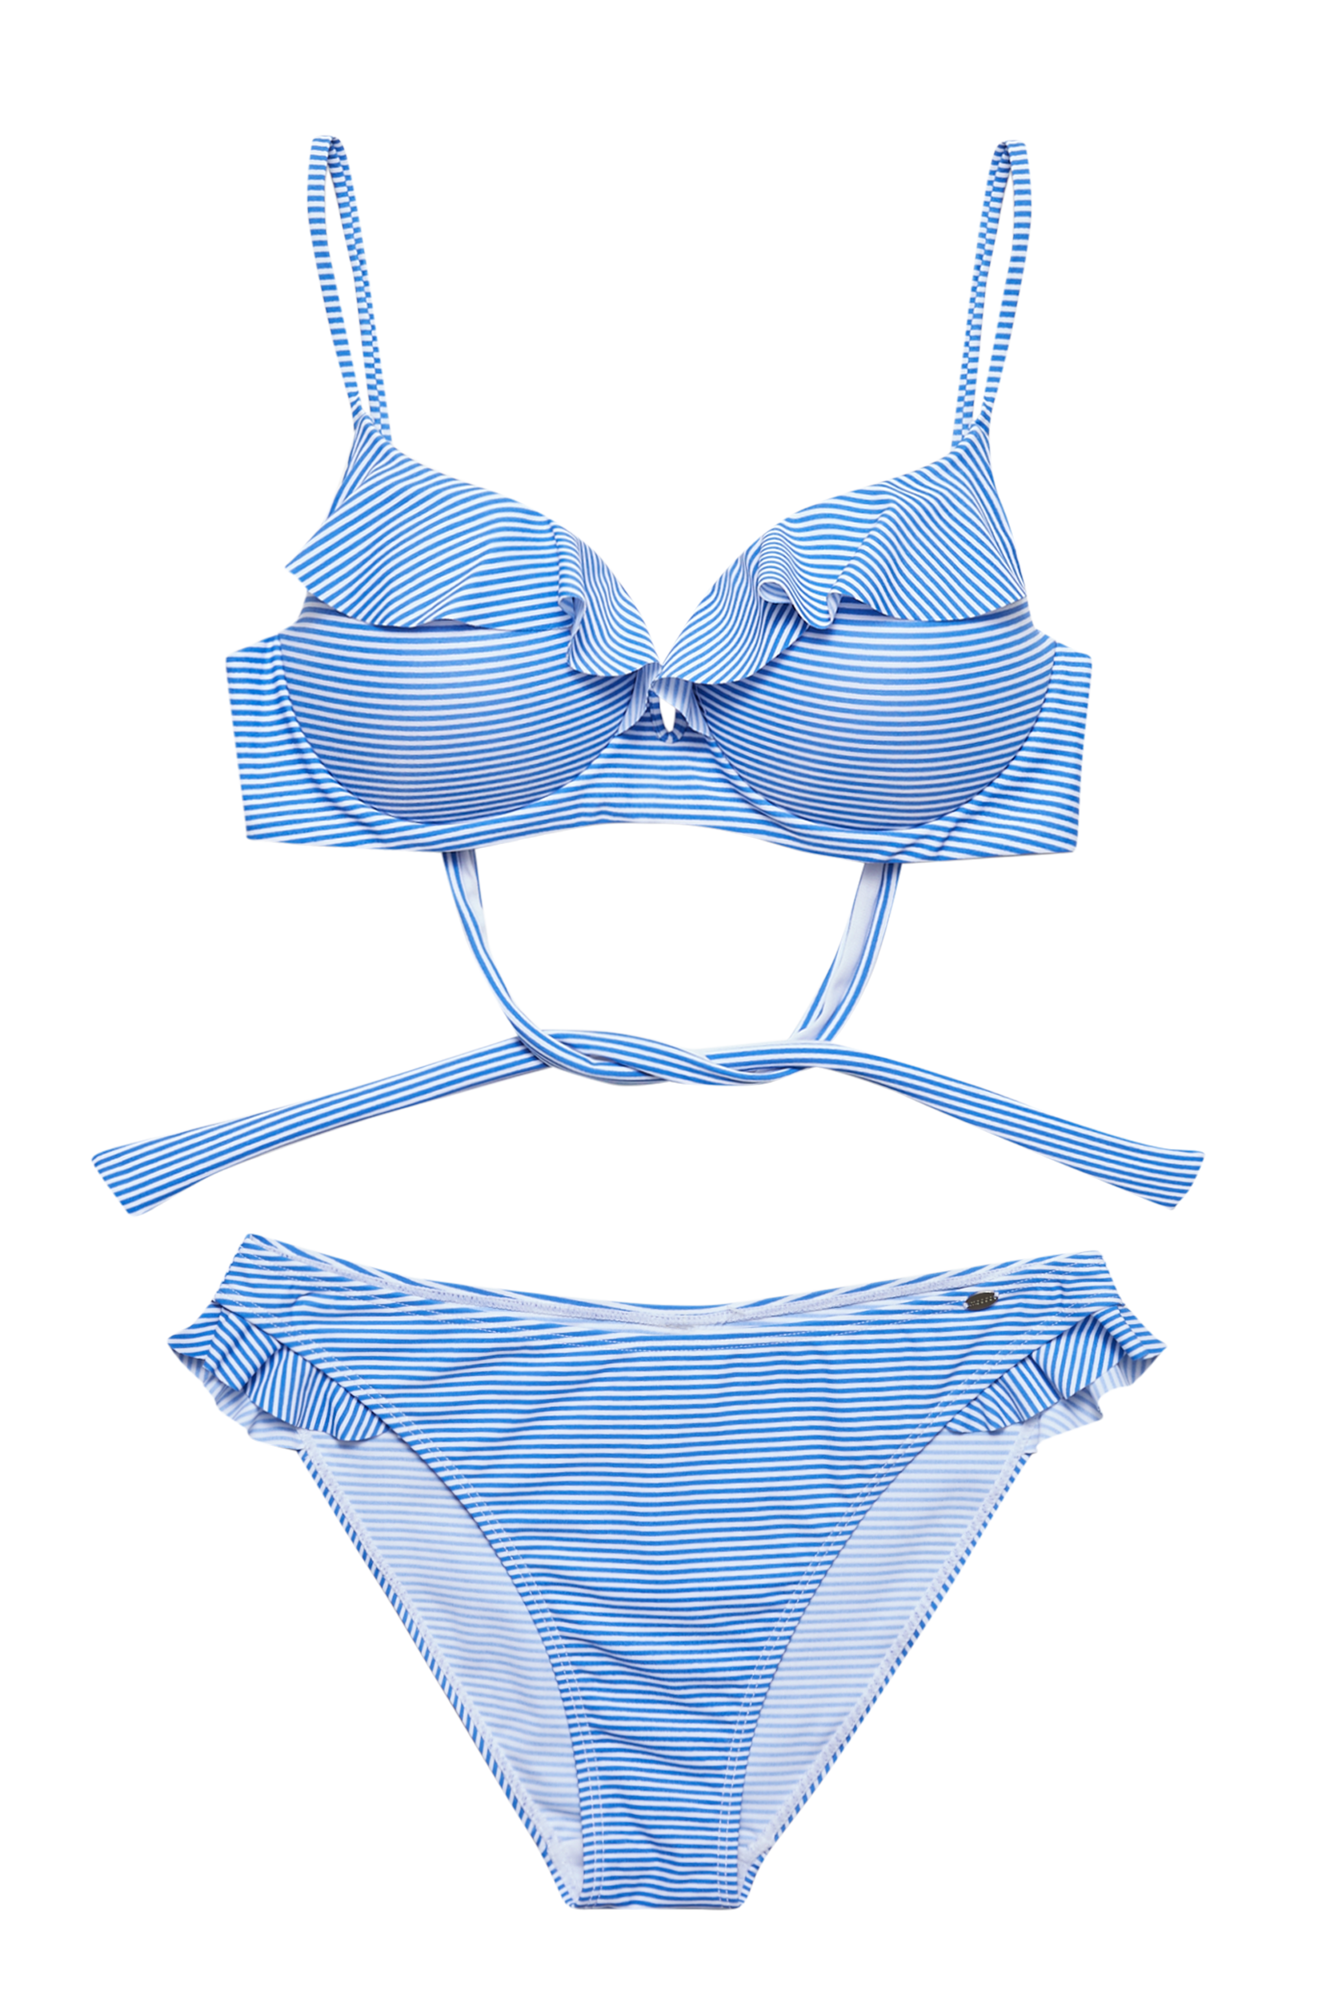 Strój kąpielowy L SB 2801 BLUE PAKIET | Moodo